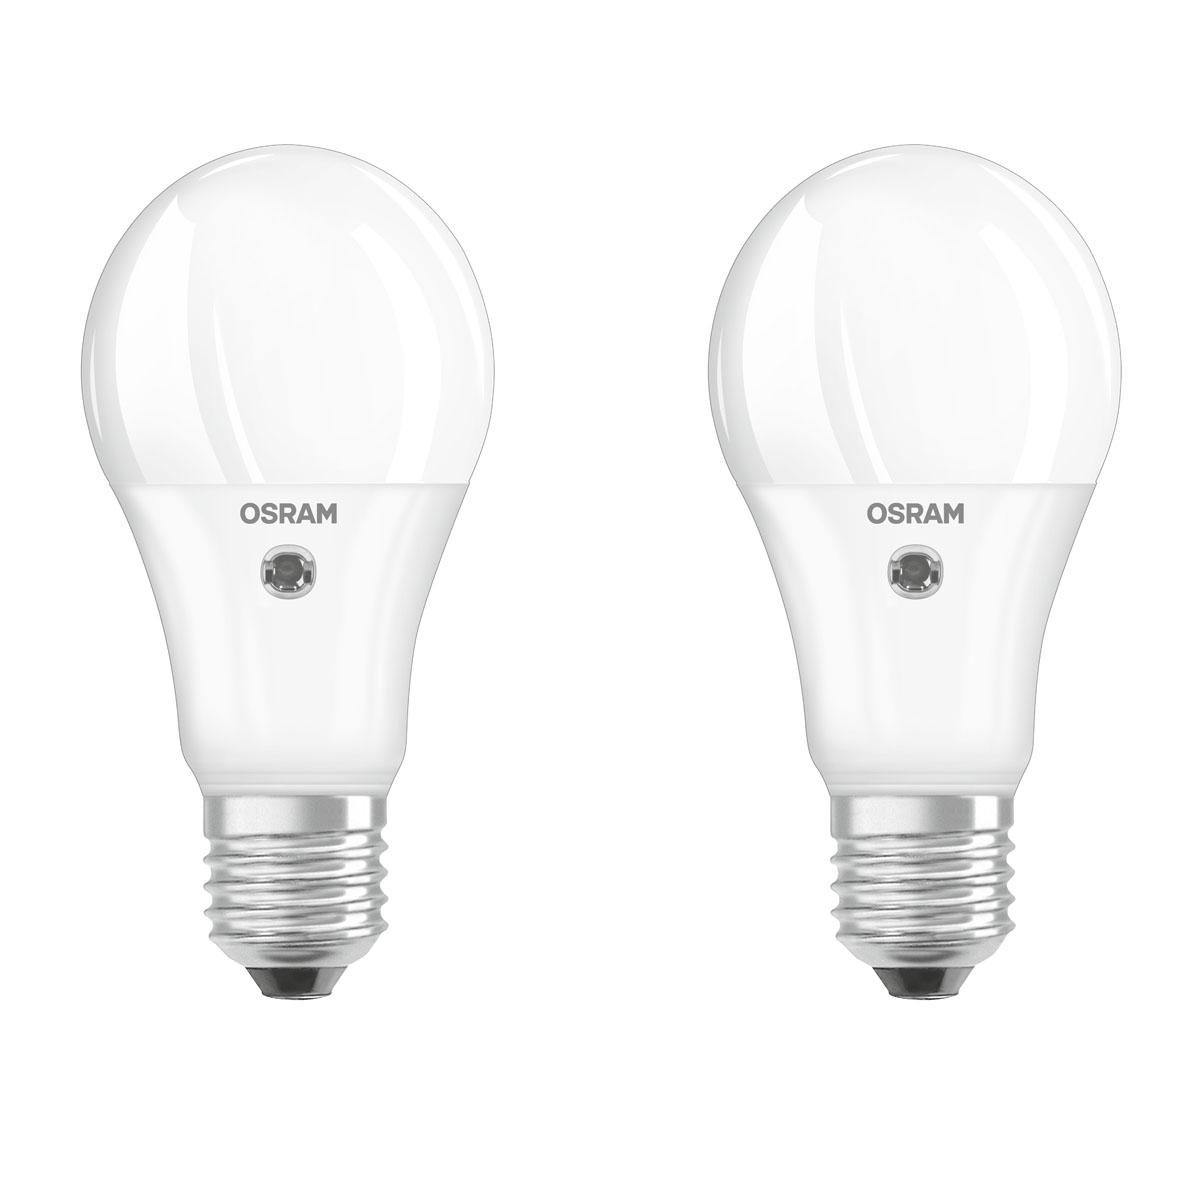 LED-Lampen OSRAM Daylight Sensor | LED-Lampen mit Zusatzfunktion ...